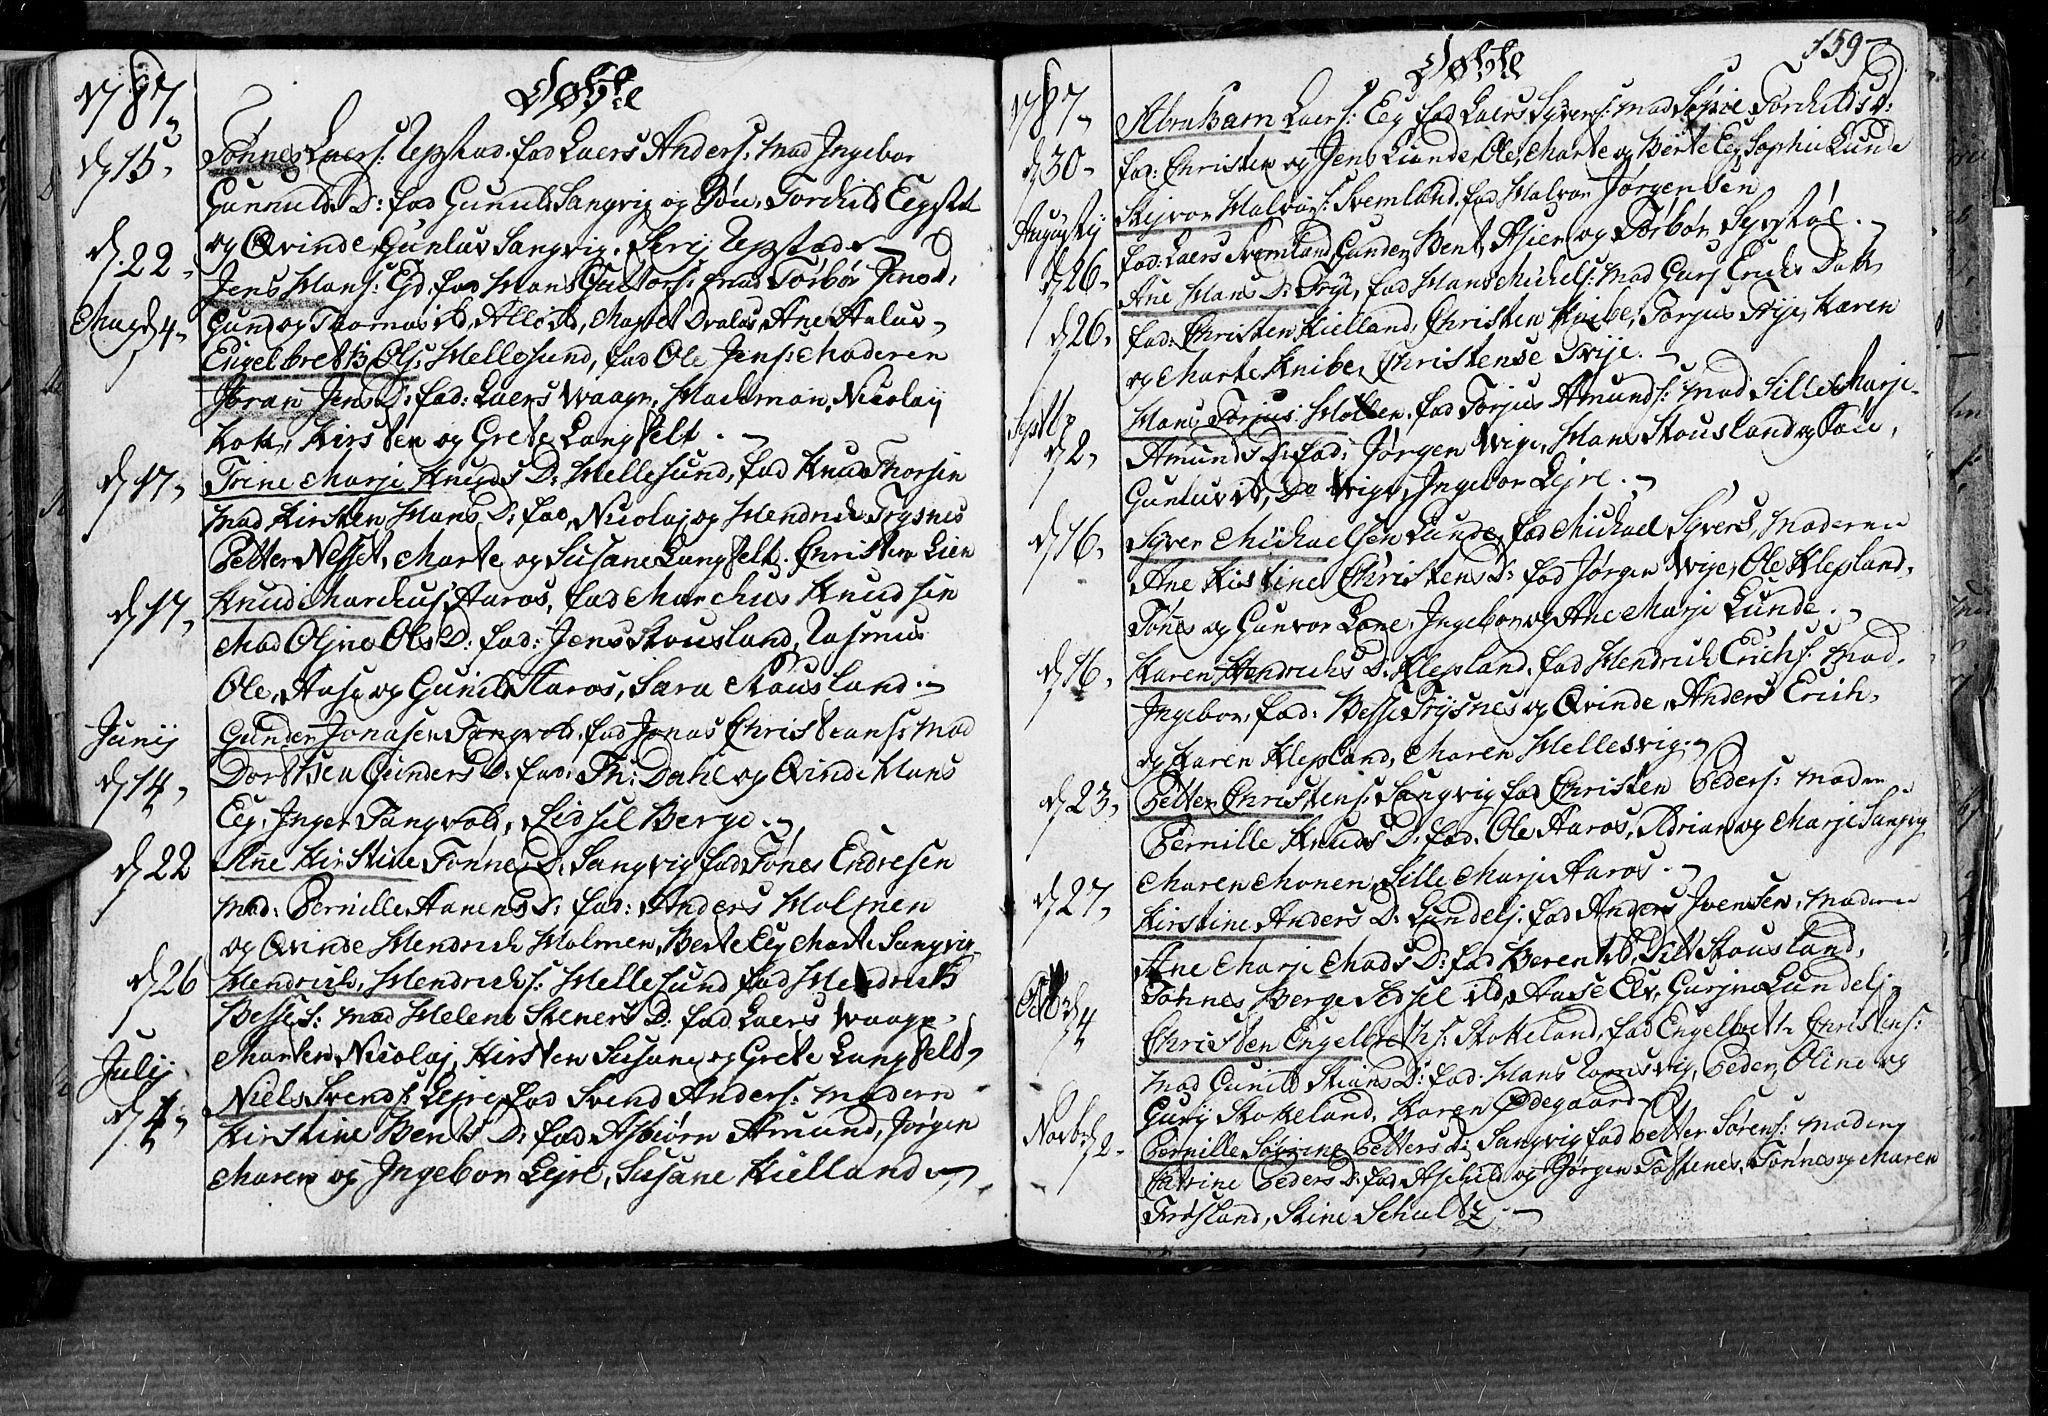 SAK, Søgne sokneprestkontor, F/Fa/Fab/L0004: Ministerialbok nr. A 4, 1770-1822, s. 158-159